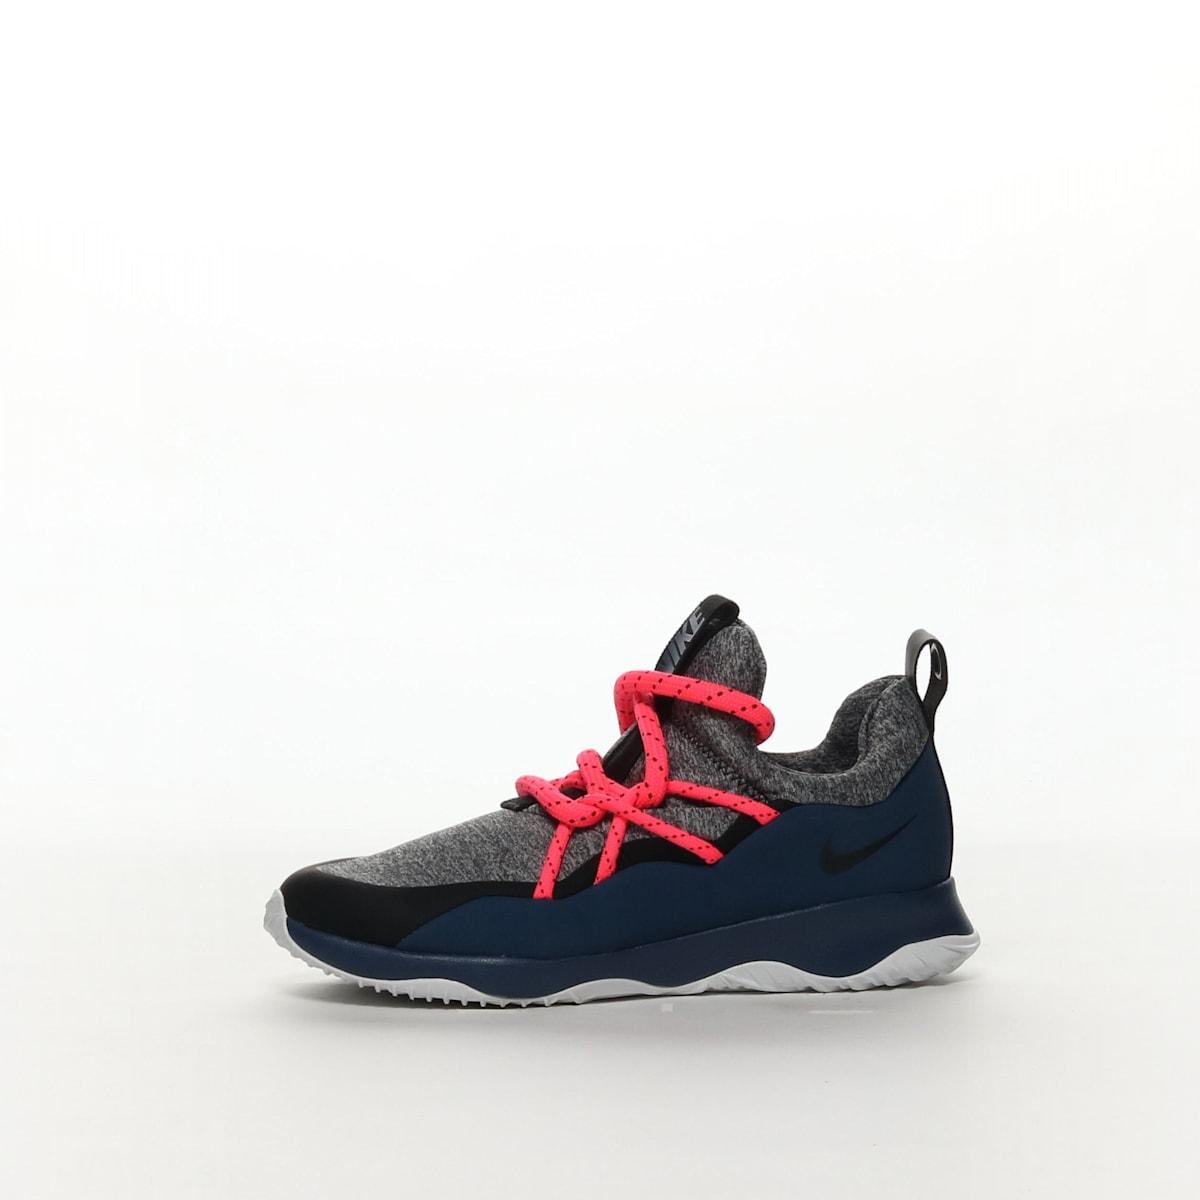 1678454bb0a Women s Nike City Loop Shoe - NAVY BLACK – Resku